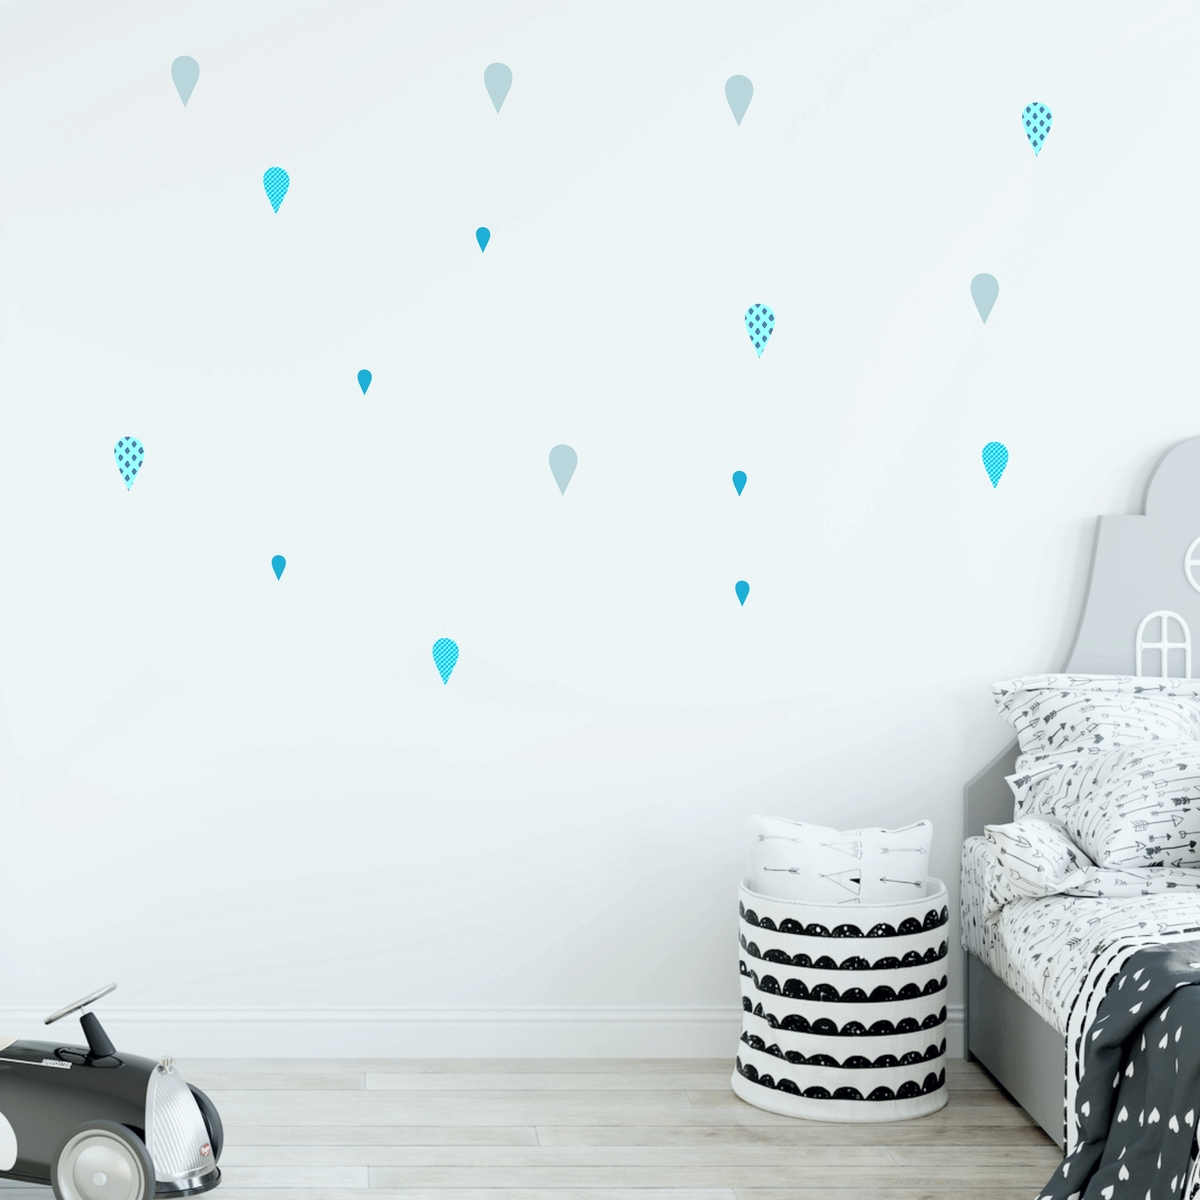 Full Size of Wandaufkleber Kinderzimmer Wandsticker Regentropfen Wassertropfen Blau Regal Weiß Regale Sofa Kinderzimmer Wandaufkleber Kinderzimmer